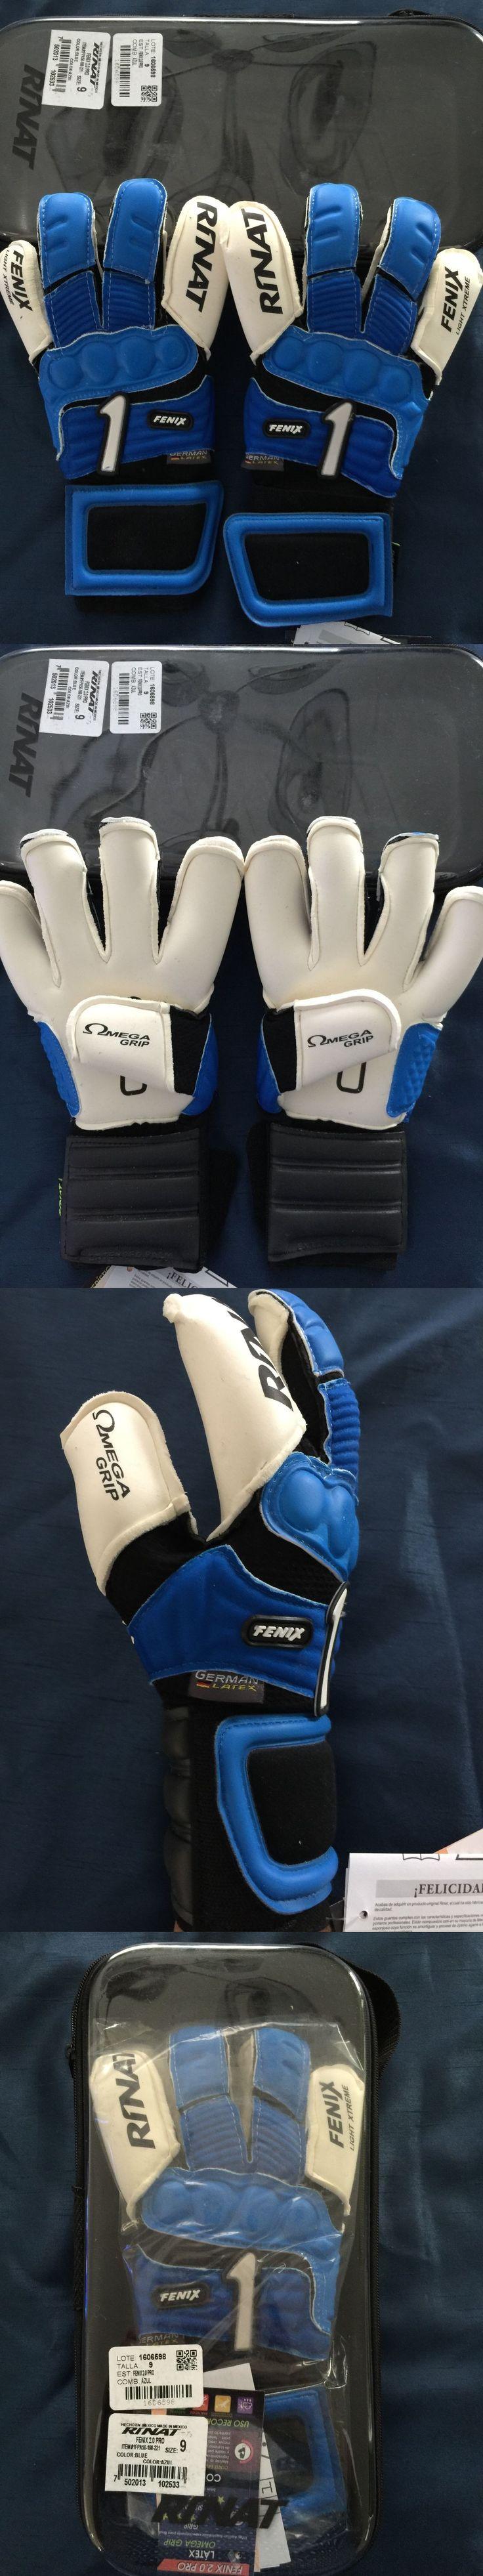 Gloves 57277: New Rinat Fenix 2.0 Pro Goalie Soccer Glove Size 8, Goalkeeper, Futbol, Football -> BUY IT NOW ONLY: $59 on eBay!